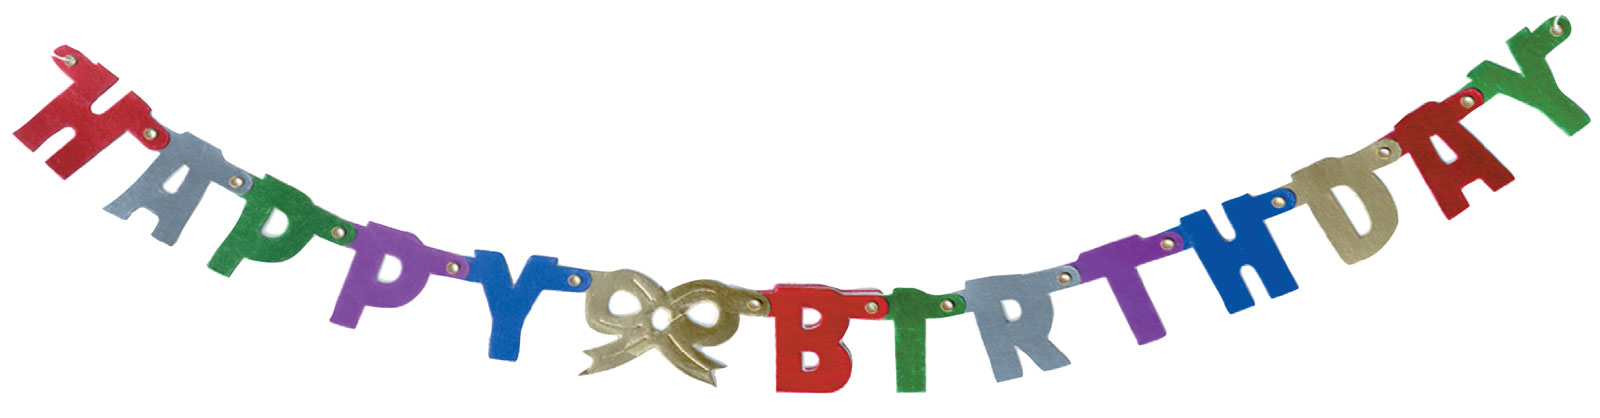 Happy Birthday Banner Clip Art-Happy Birthday Banner Clip Art-15